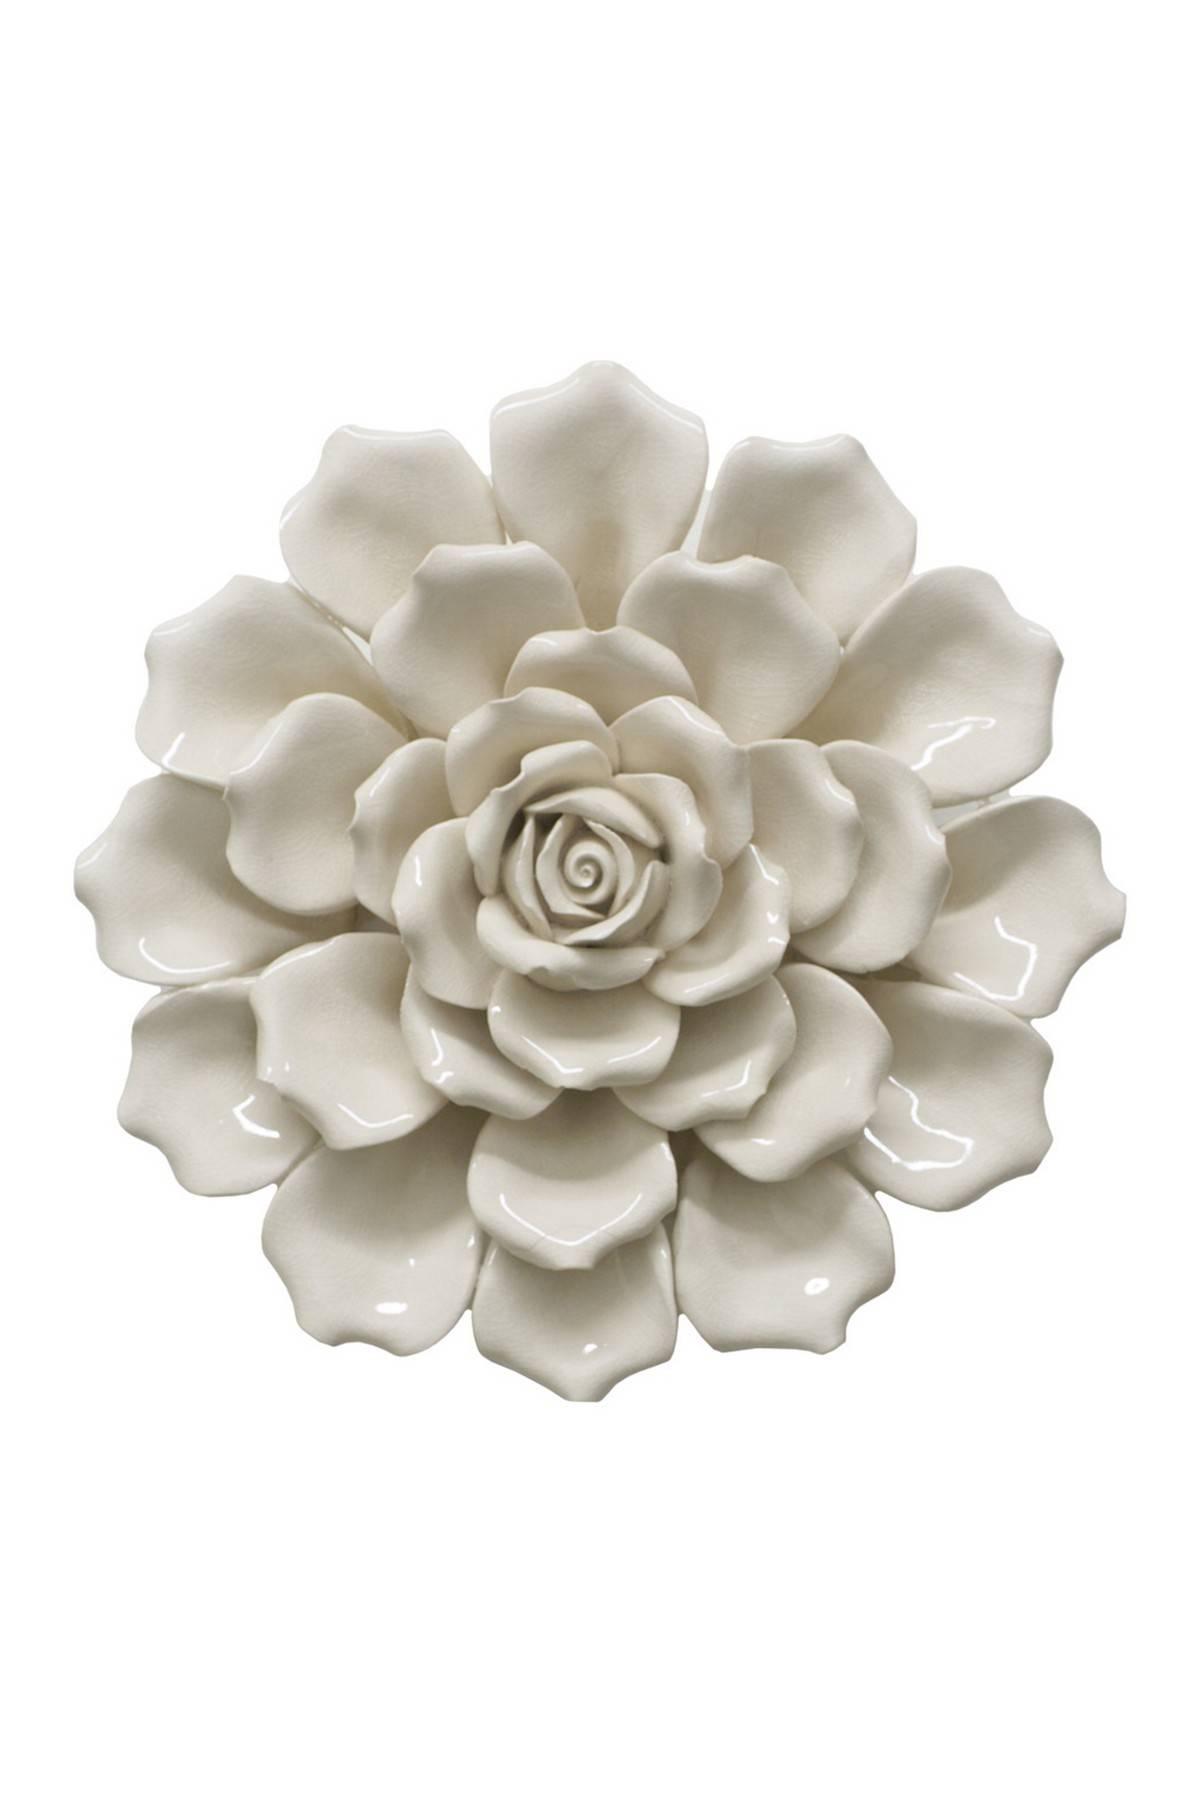 Imposing Ideas Ceramic Flower Wall Decor Spectacular Design Pertaining To Recent Ceramic Flower Wall Art (View 4 of 30)